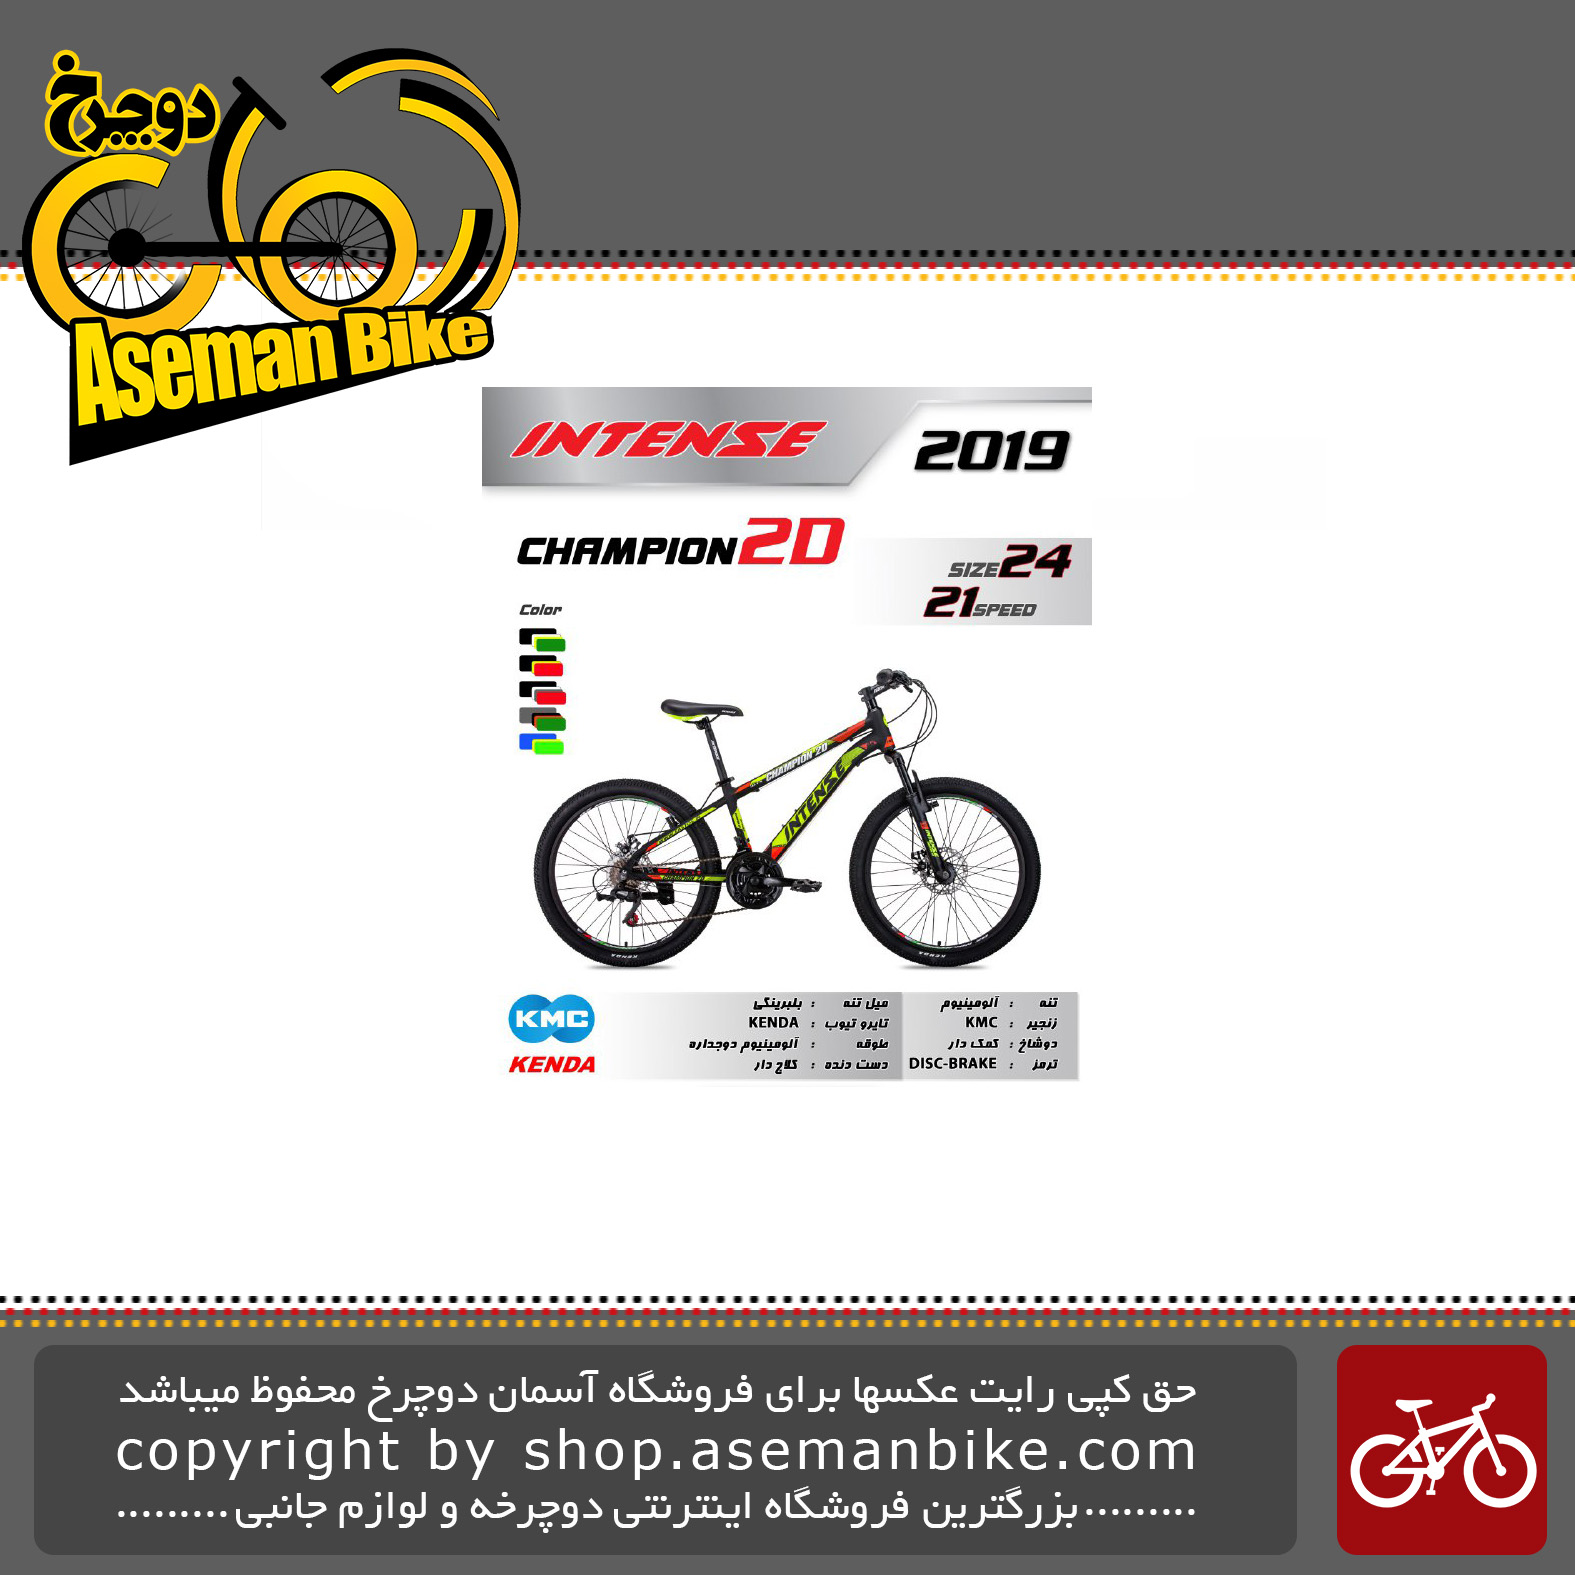 دوچرخه کوهستان اینتنس طرح چمپیون 2 دی سایز 24 21 سرعته 2019 Intense Mountain Bicycle Champion 2D 24 21 Speed 2019